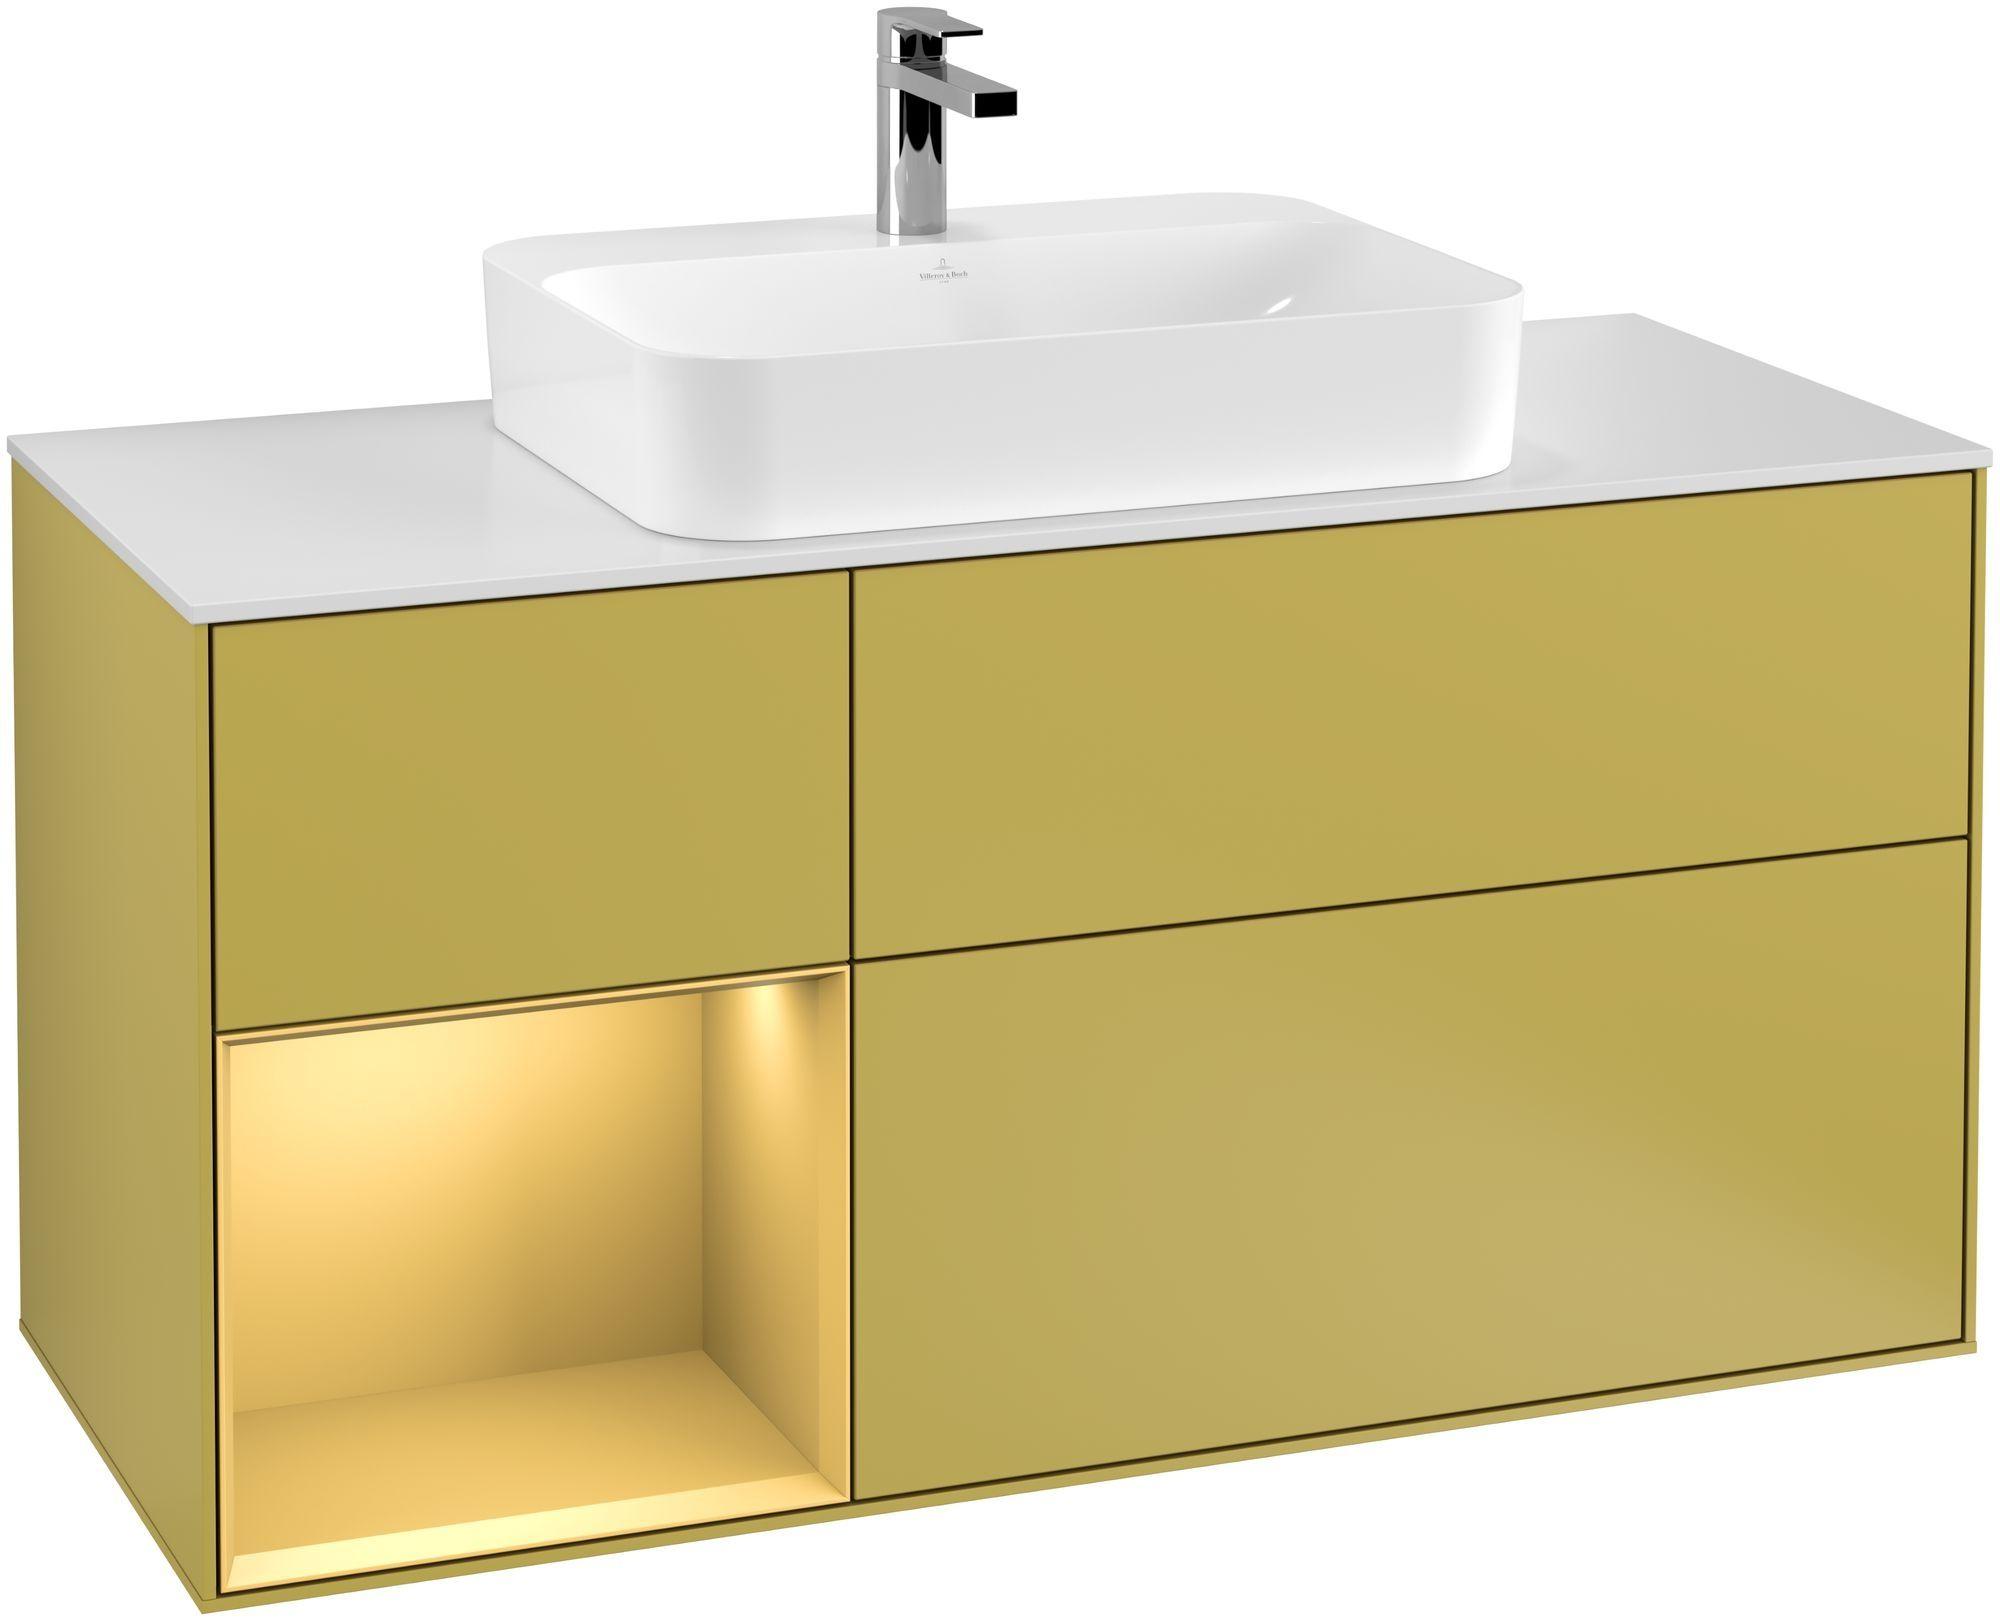 Villeroy & Boch Finion G41 Waschtischunterschrank mit Regalelement 3 Auszüge Waschtisch mittig LED-Beleuchtung B:120xH:60,3xT:50,1cm Front, Korpus: Sun, Regal: Gold Matt, Glasplatte: White Matt G411HFHE